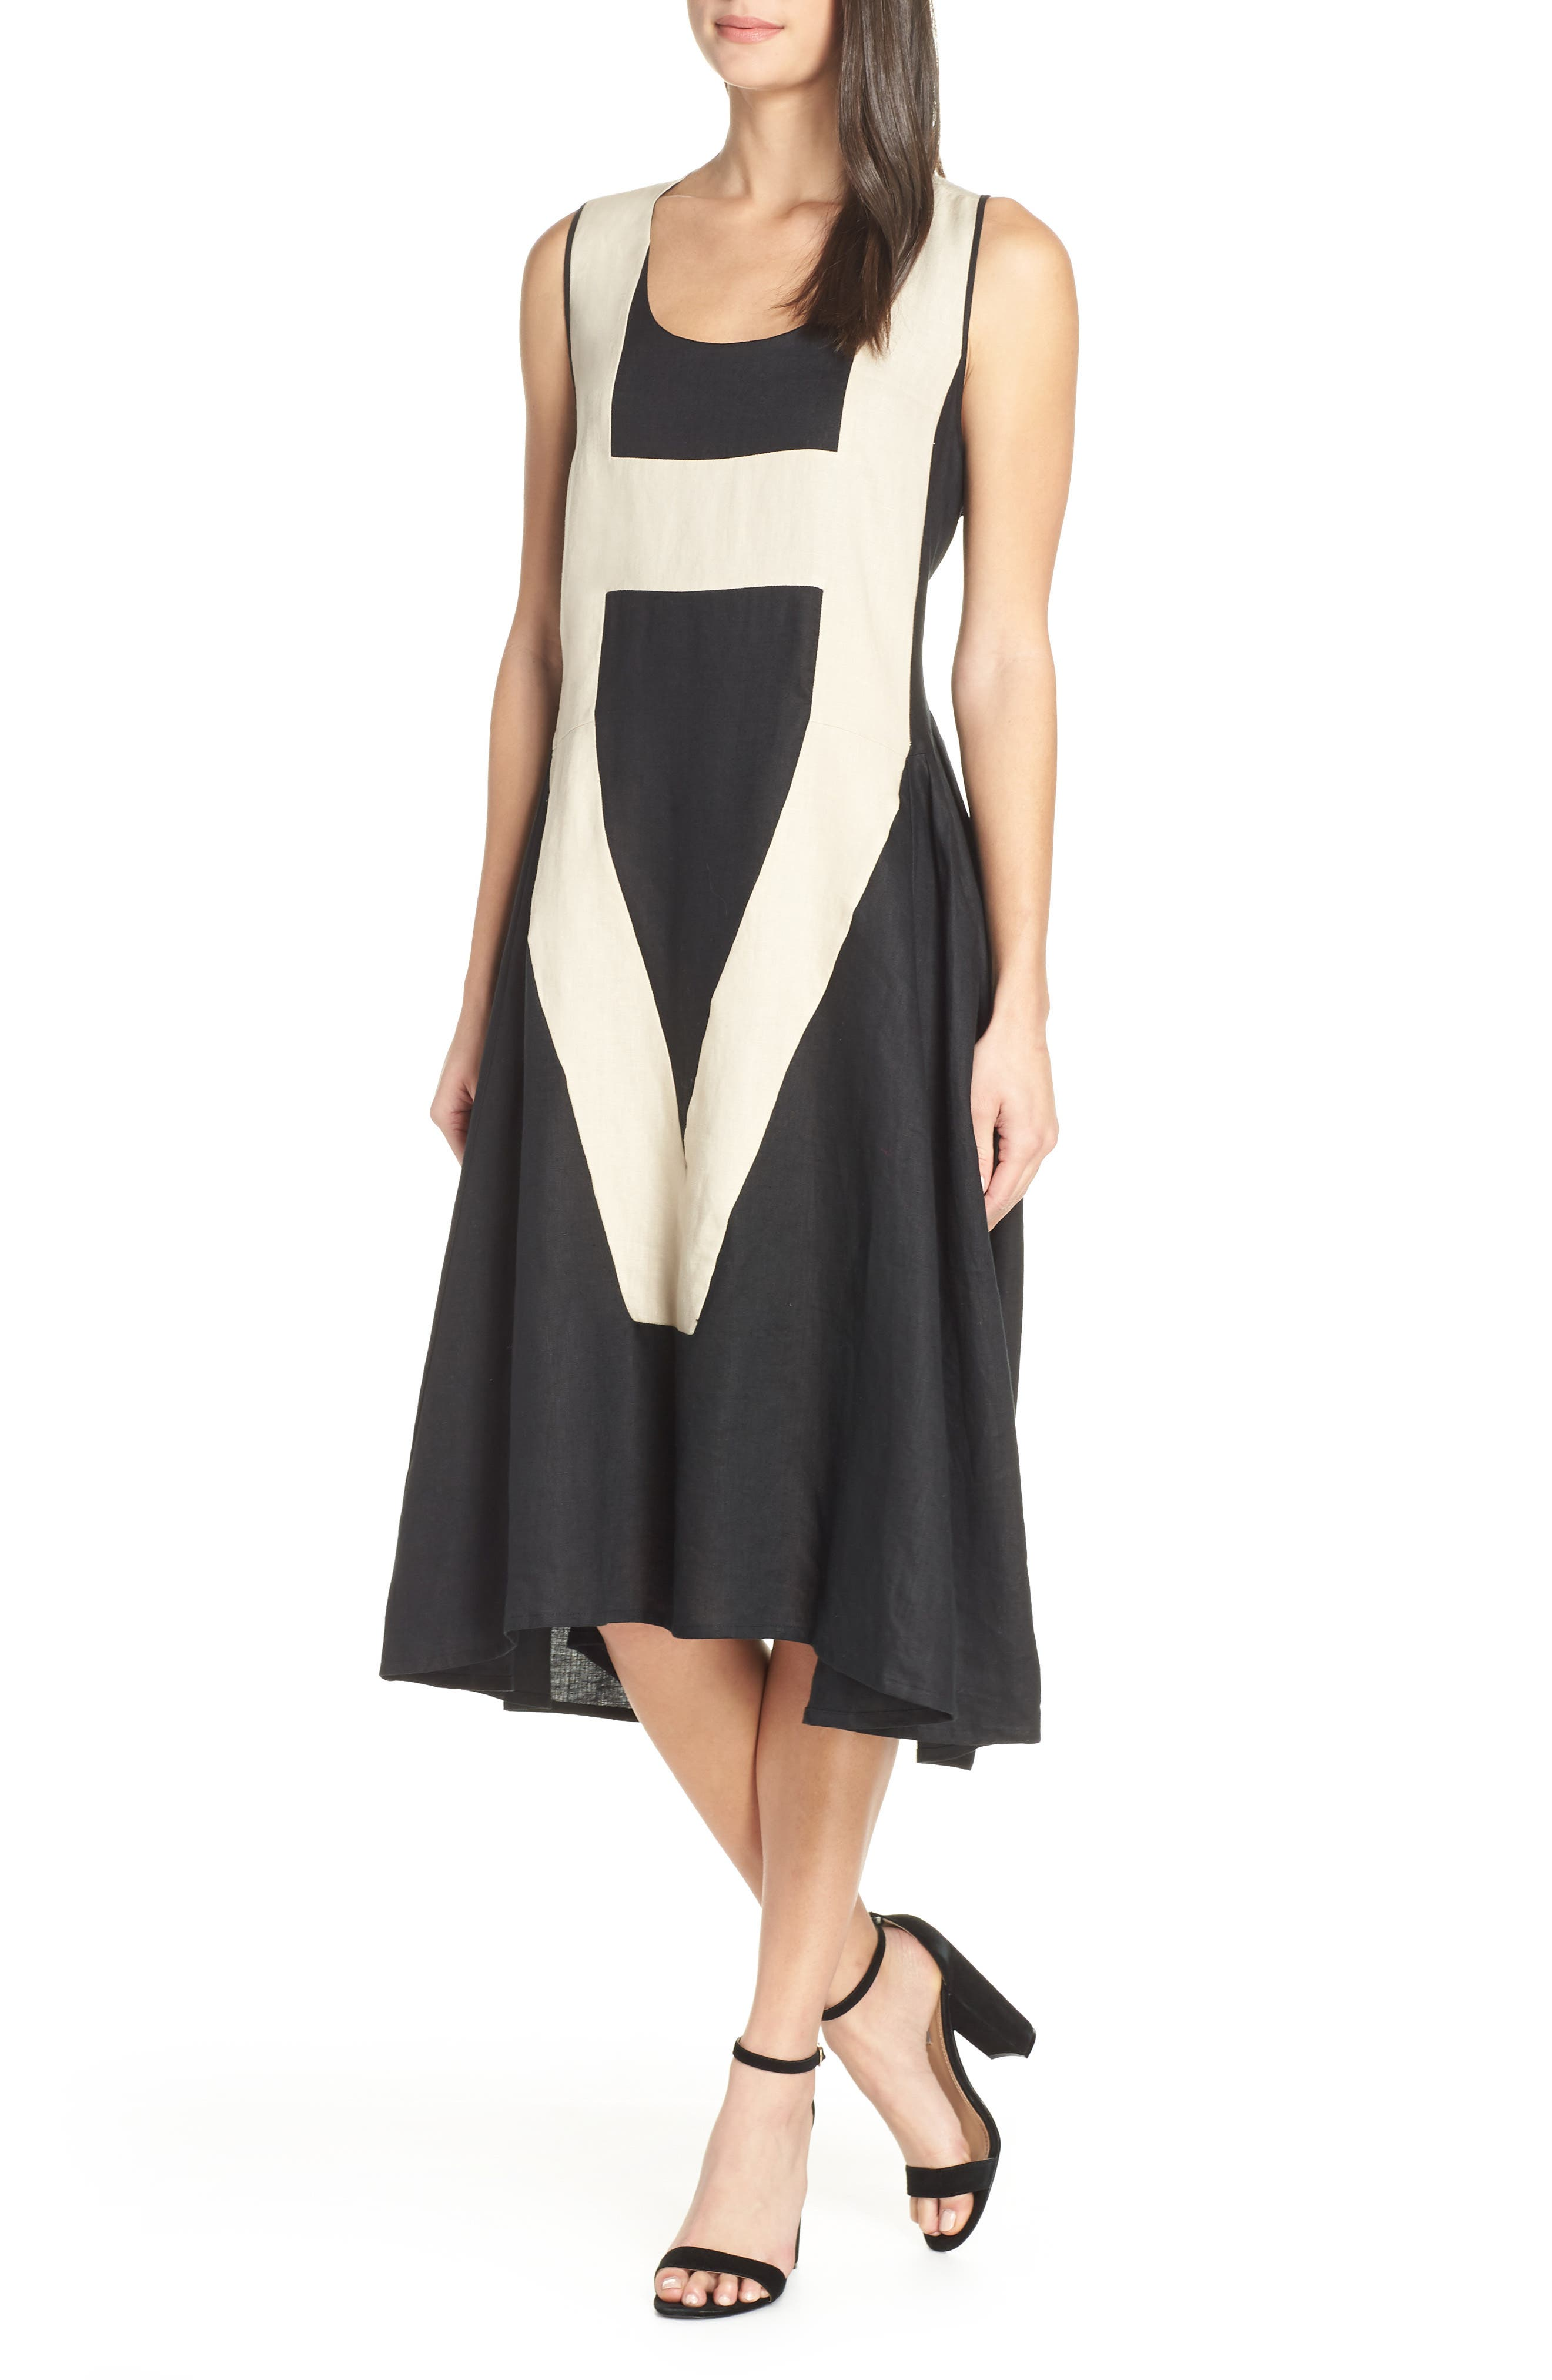 CAARA, Betha Colorblock Tie Back Dress, Main thumbnail 1, color, 001